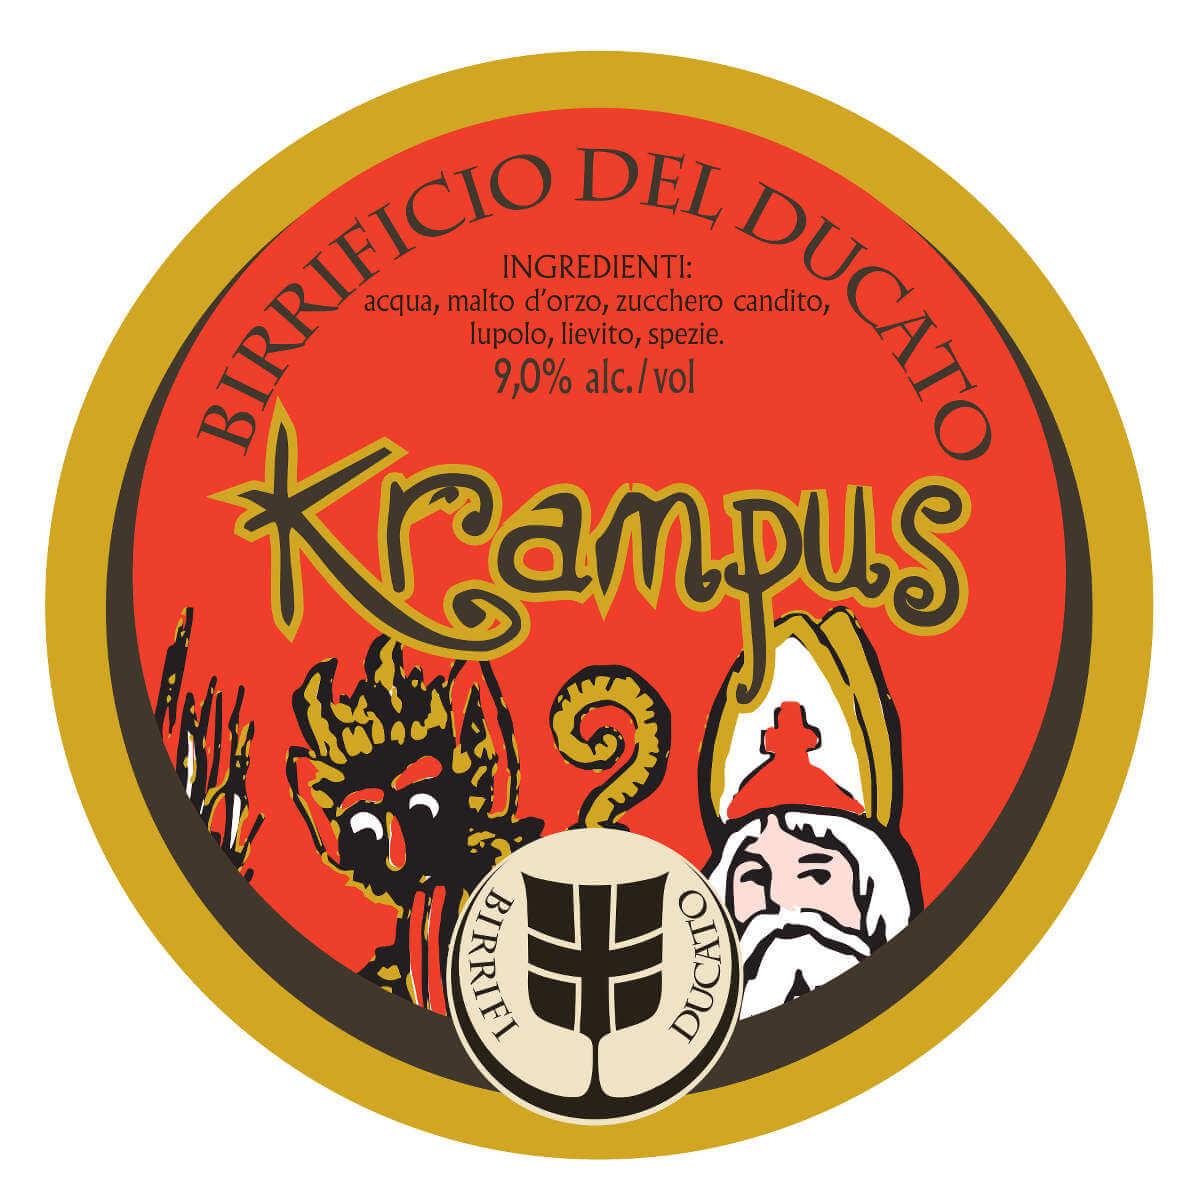 Birrificio Del Ducato Krampus label